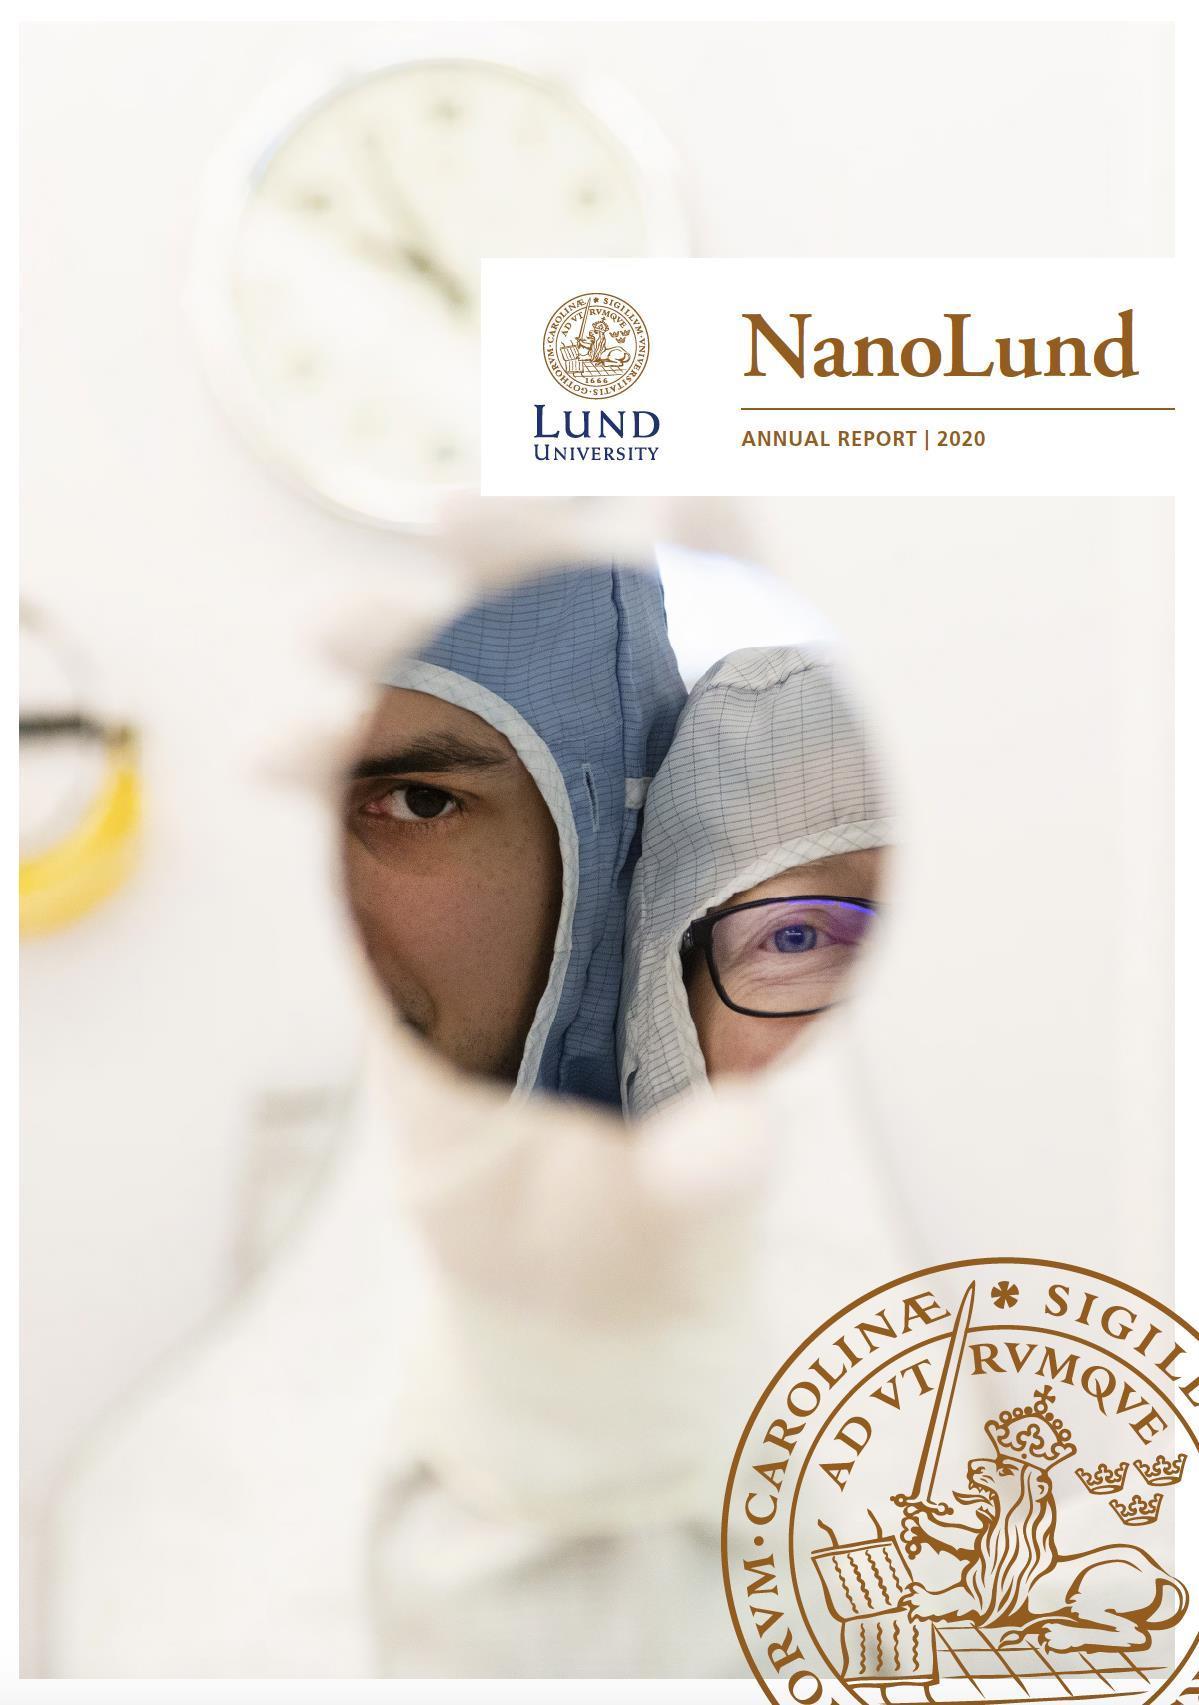 Cover of NanoLund's Annual Report 2020